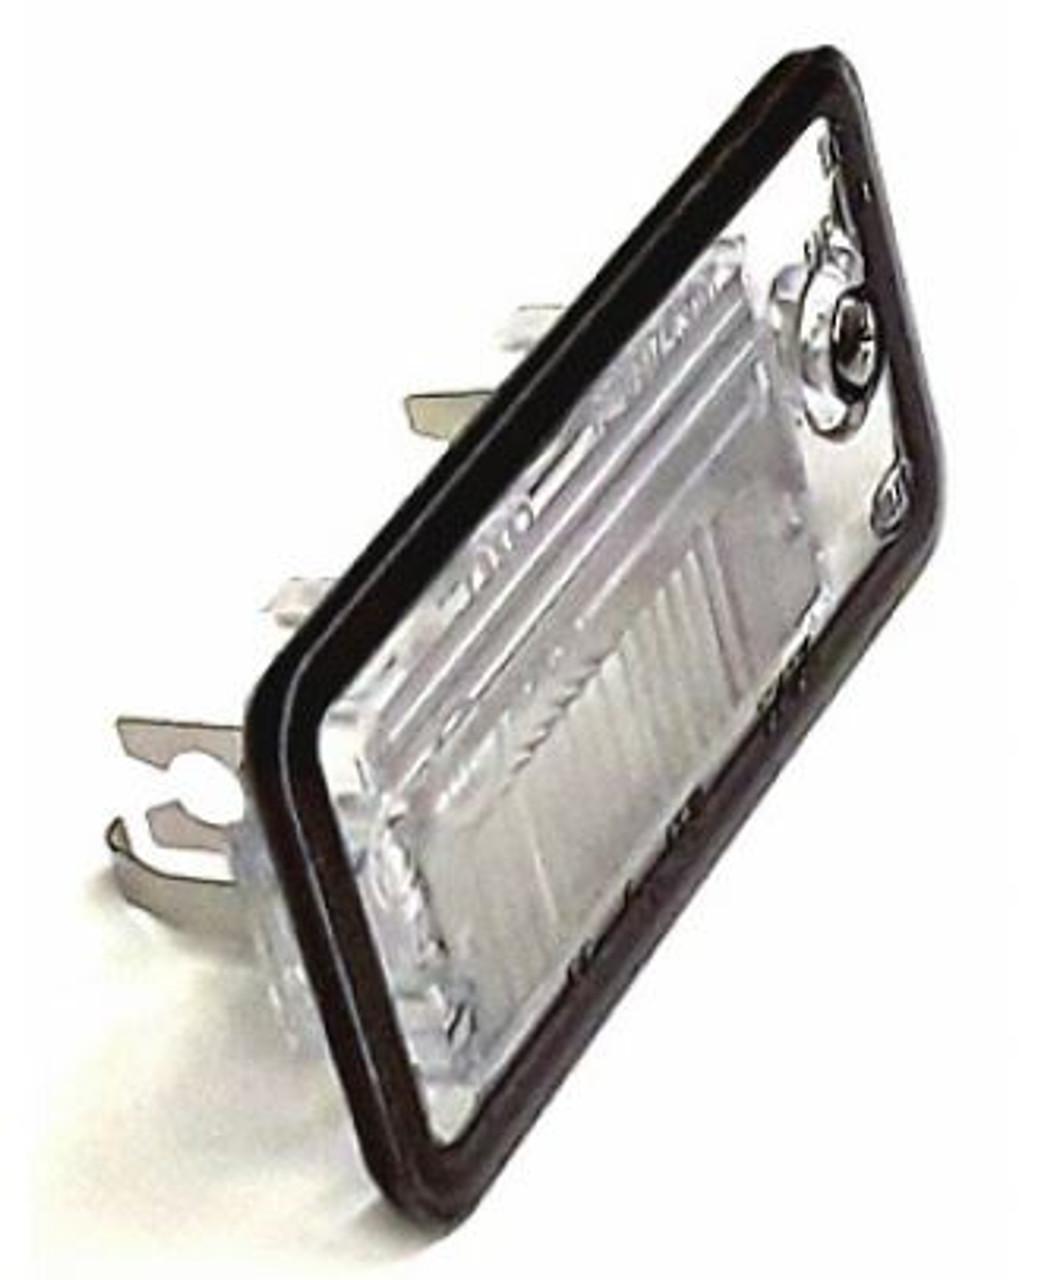 Genuine Audi Number Plate Lamp 8E0943022B